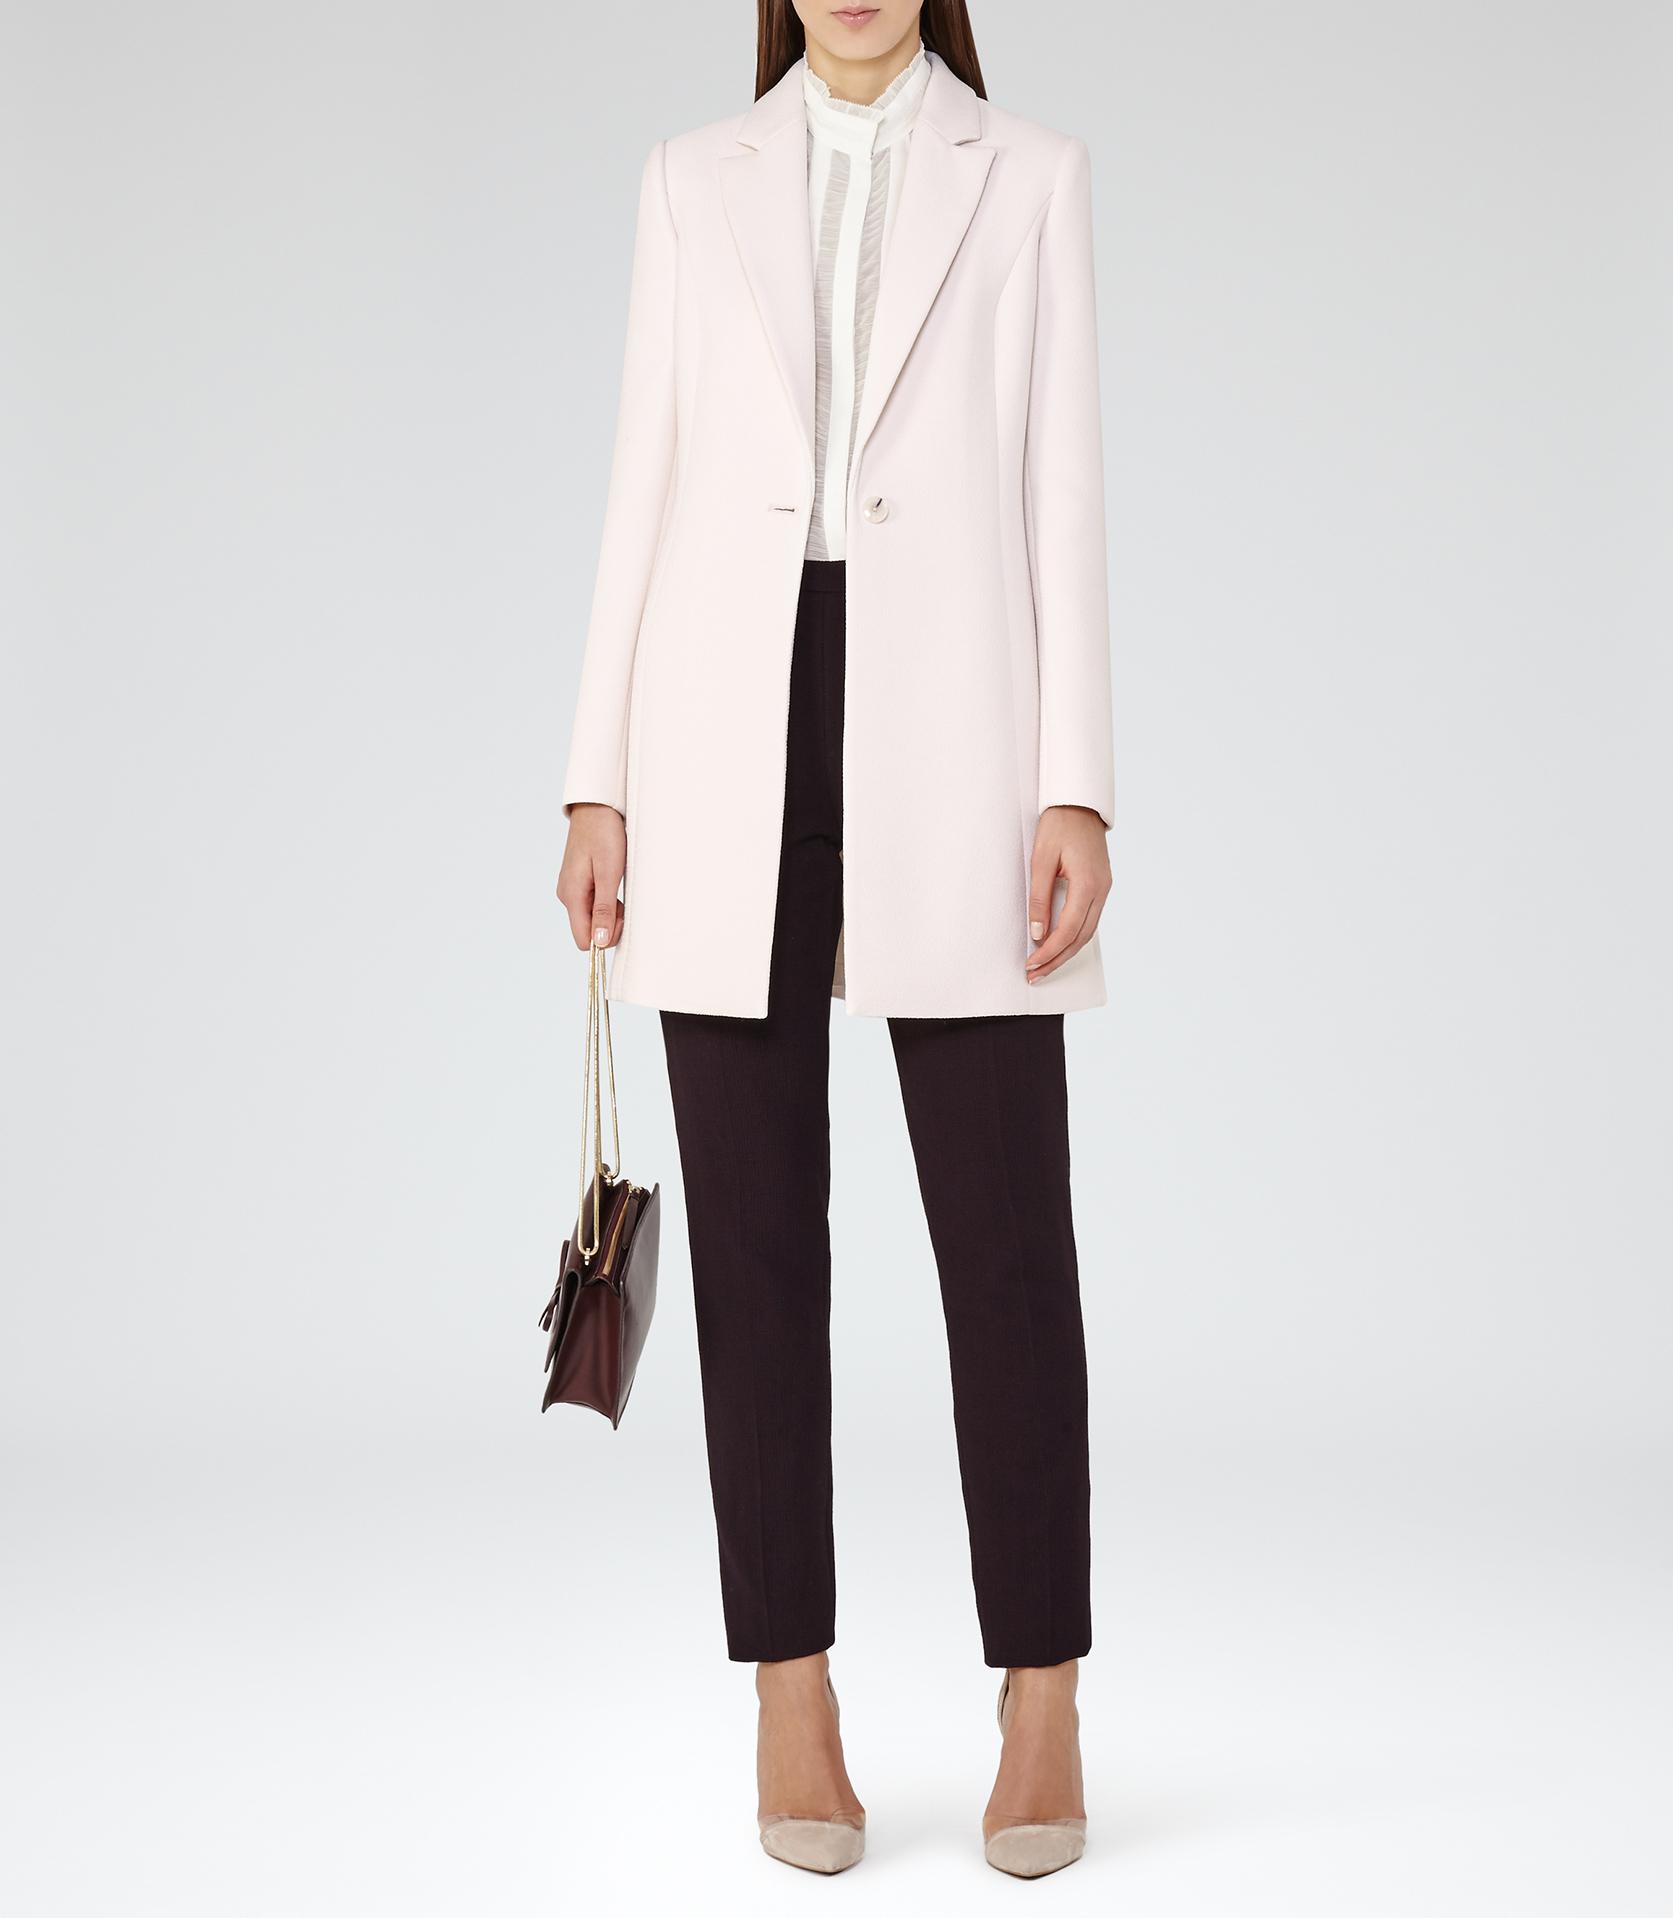 Reiss Argento Longline Tailored Coat in White | Lyst